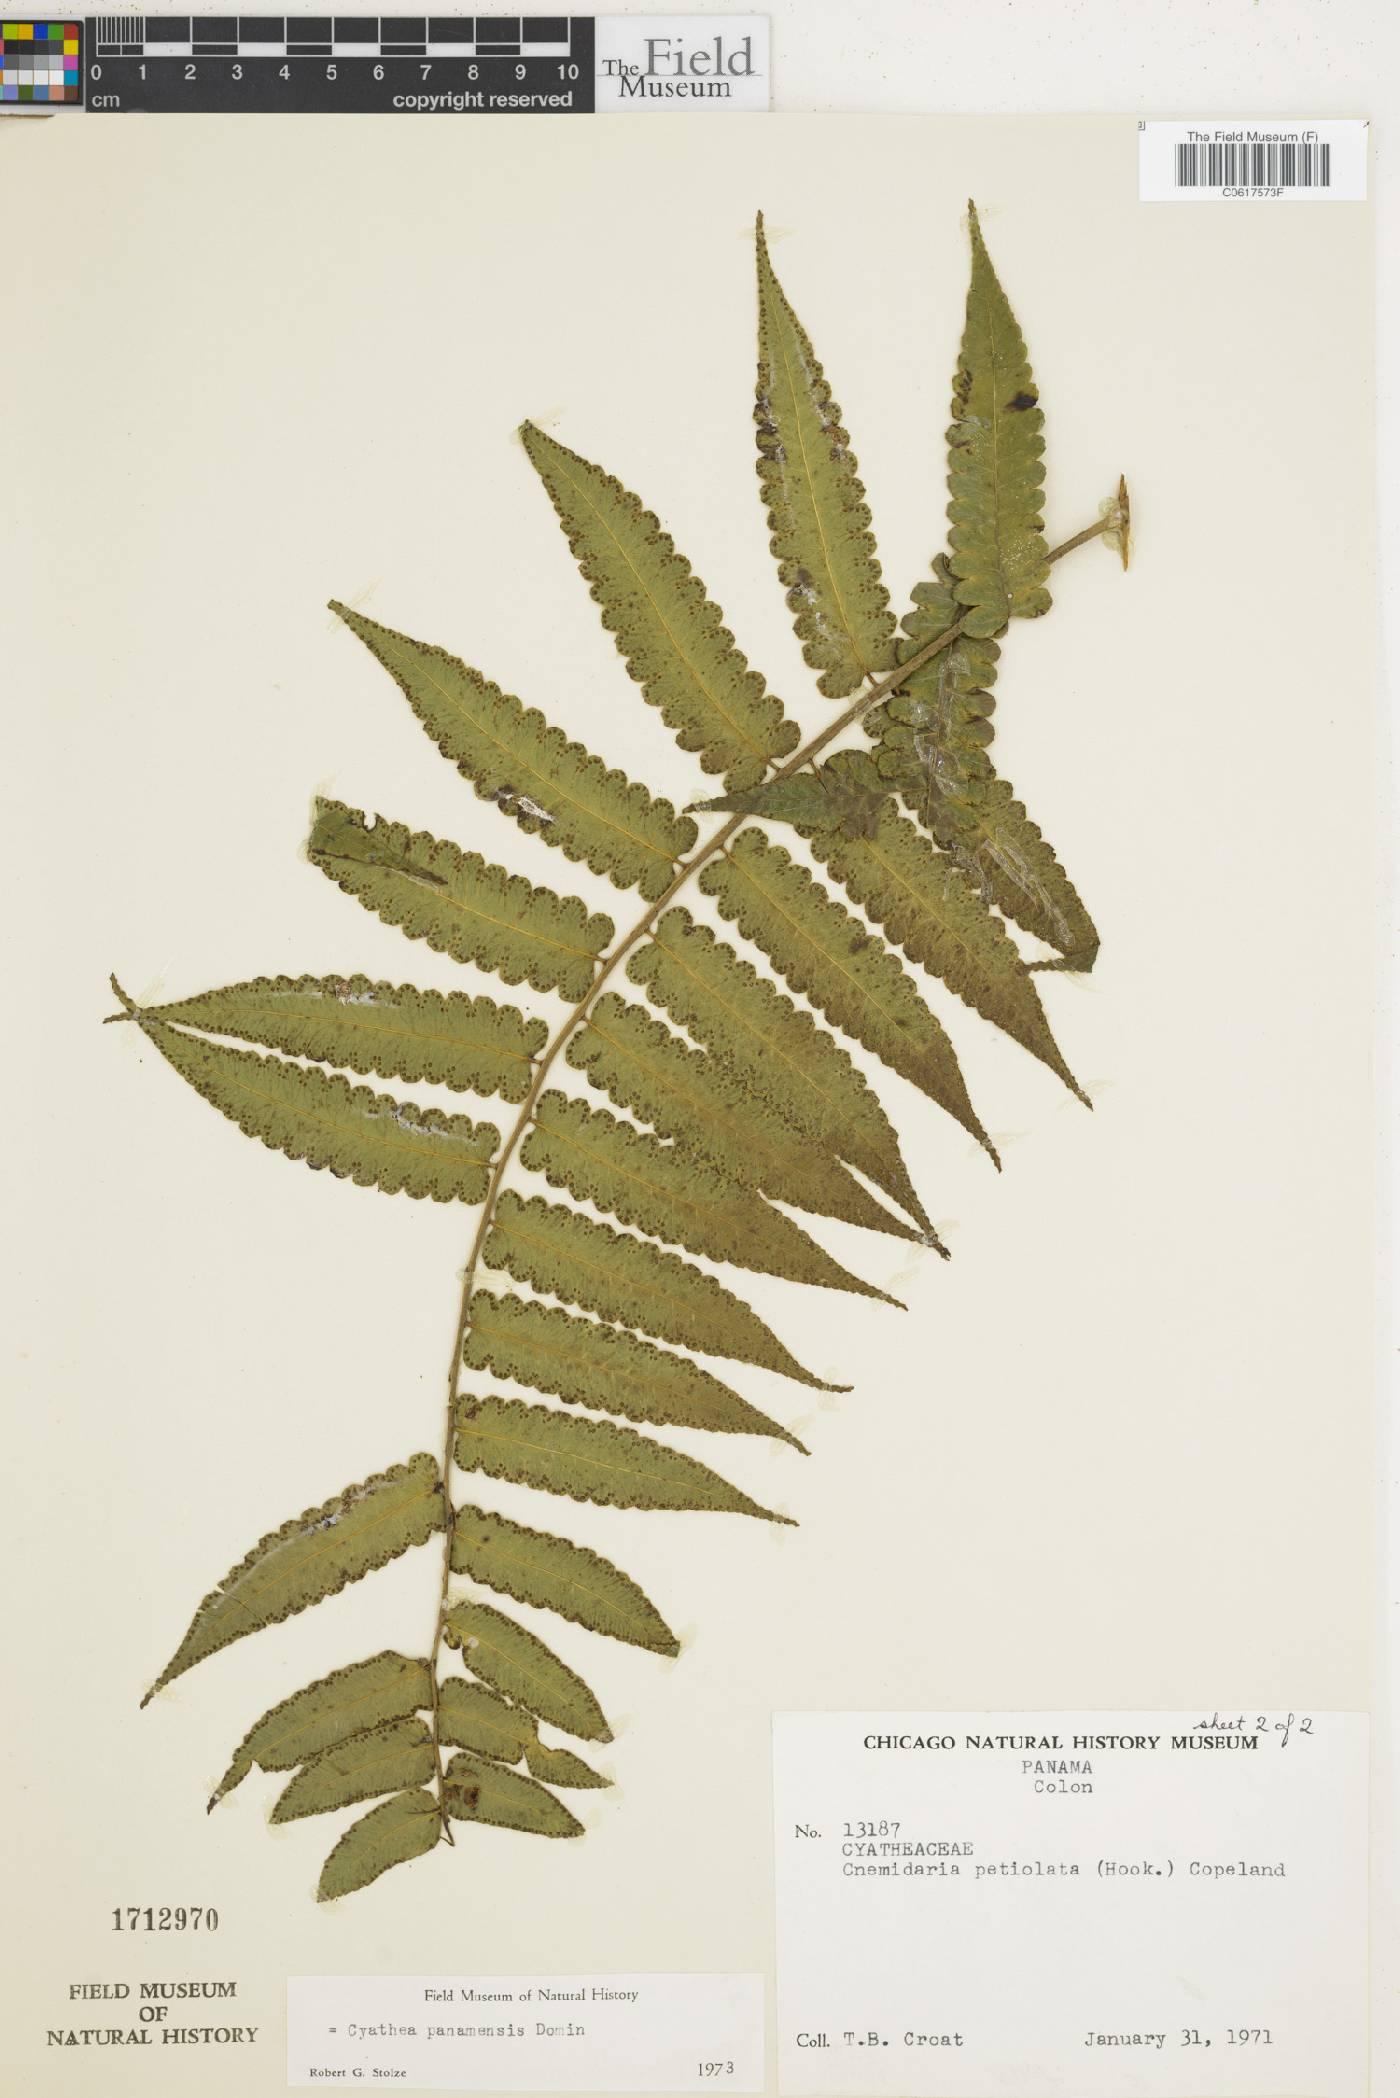 Cyathea panamensis image